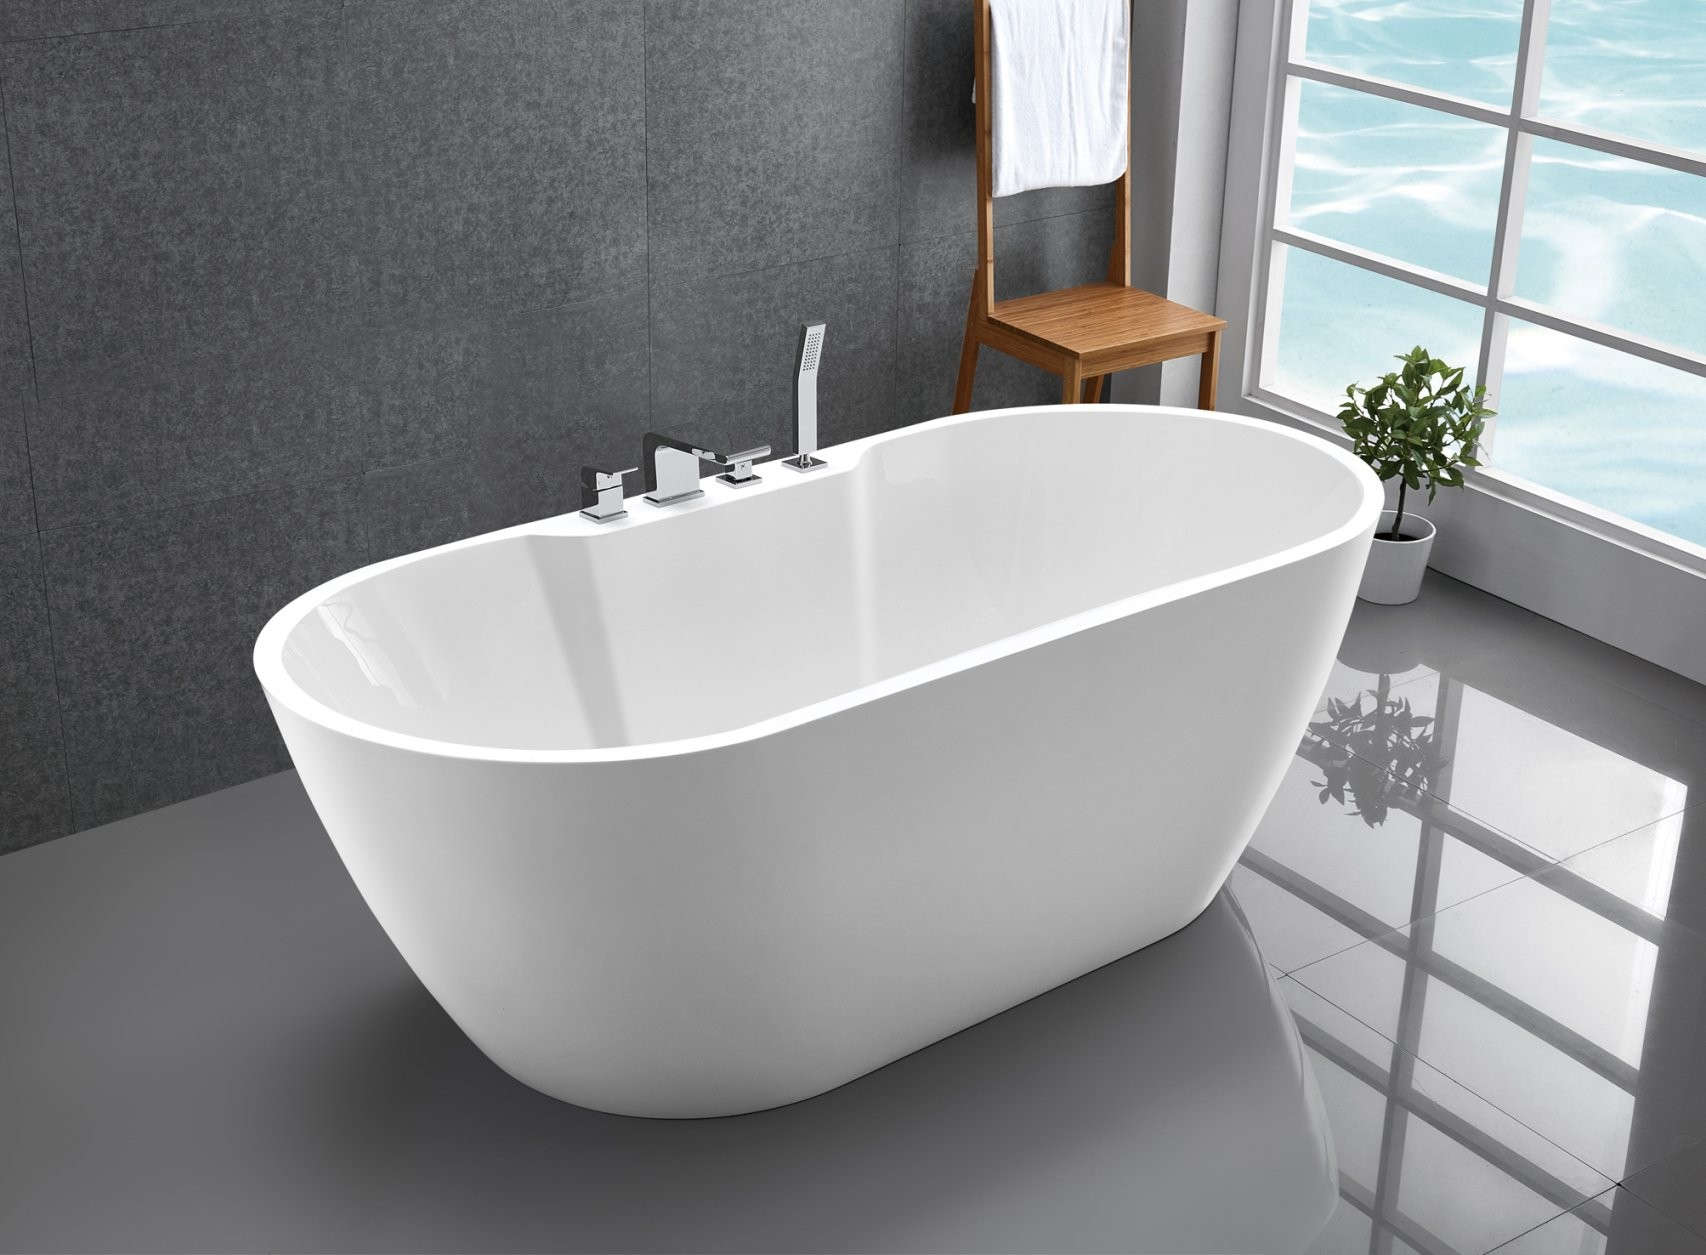 Freistehende Badewanne Standbadewanne Acryl Jazz Plus Weiß 170 X 80 von Acryl Badewanne Freistehend Bild